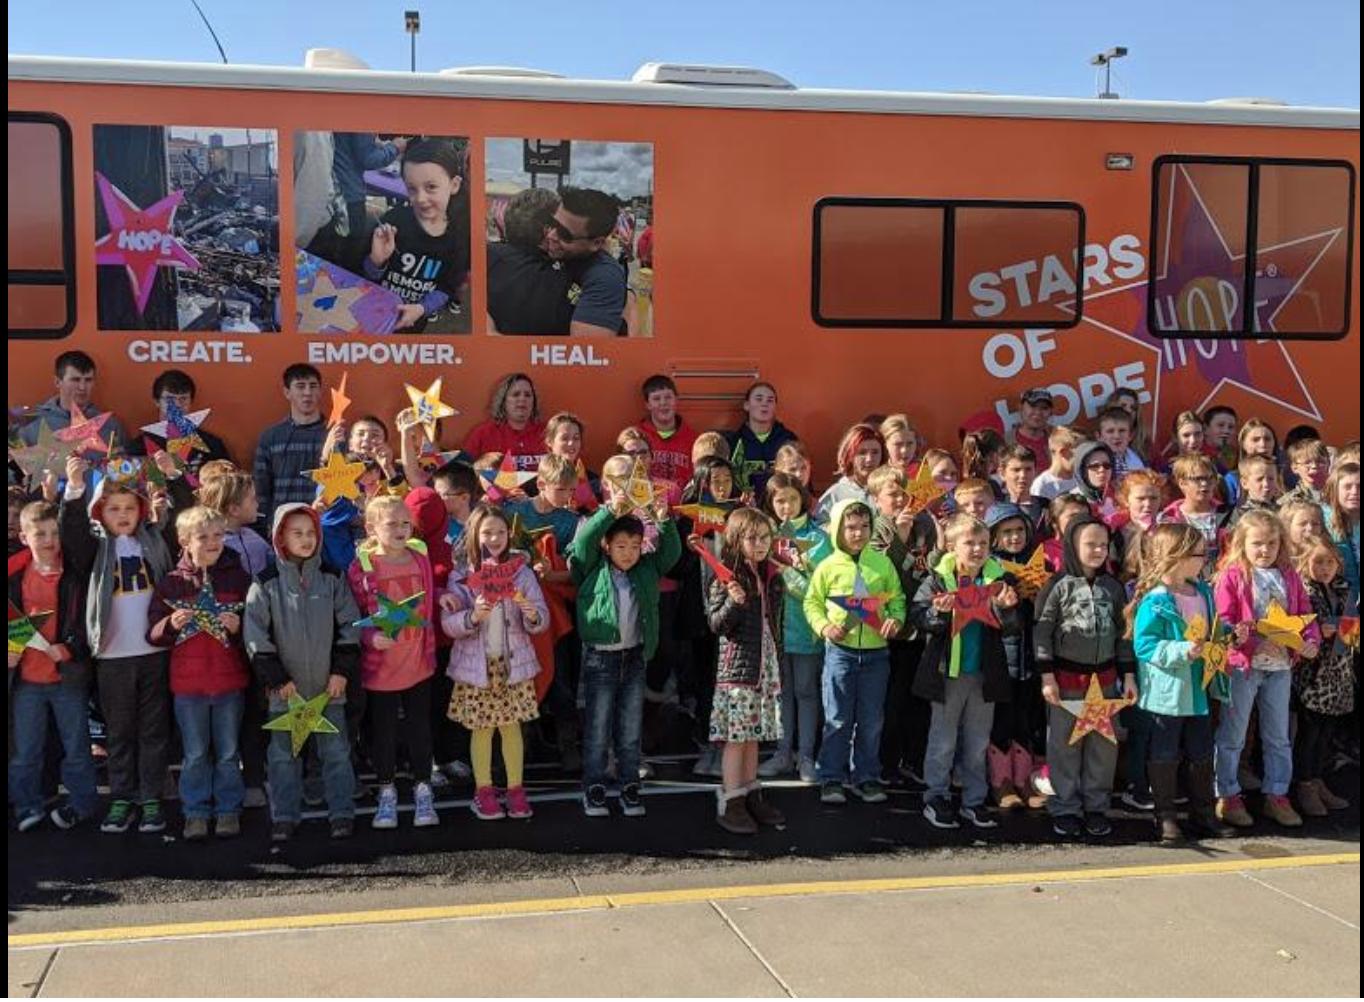 Stars of Hope tour visits Greensburg